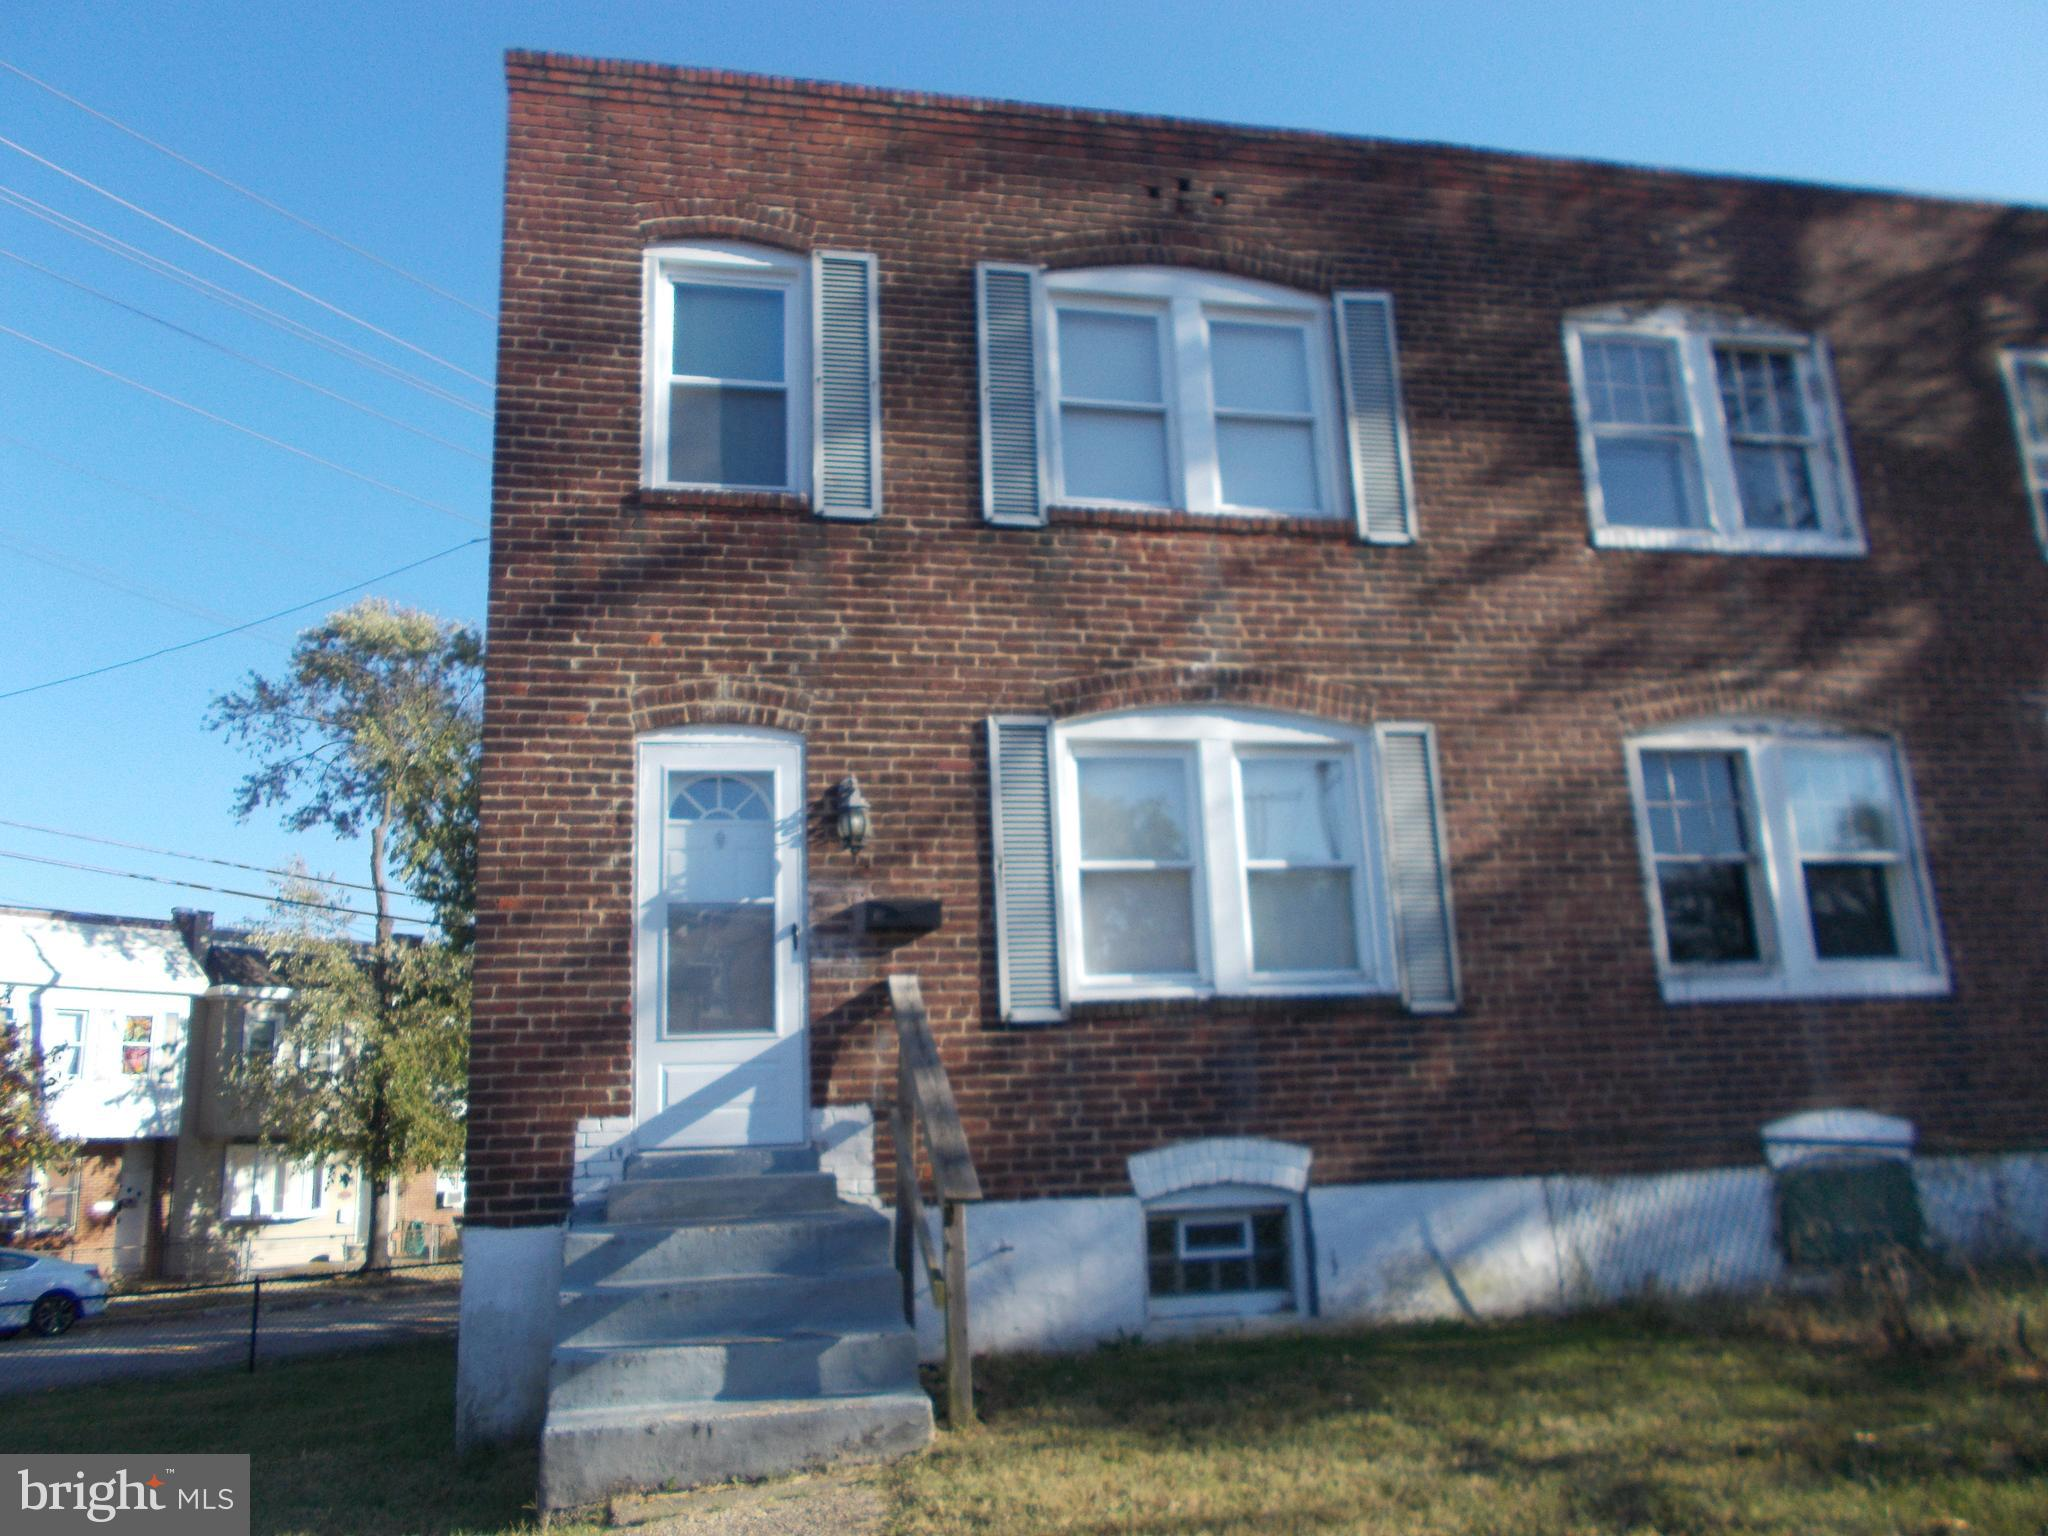 3601 EVERETT St, Baltimore City, MD, 21226